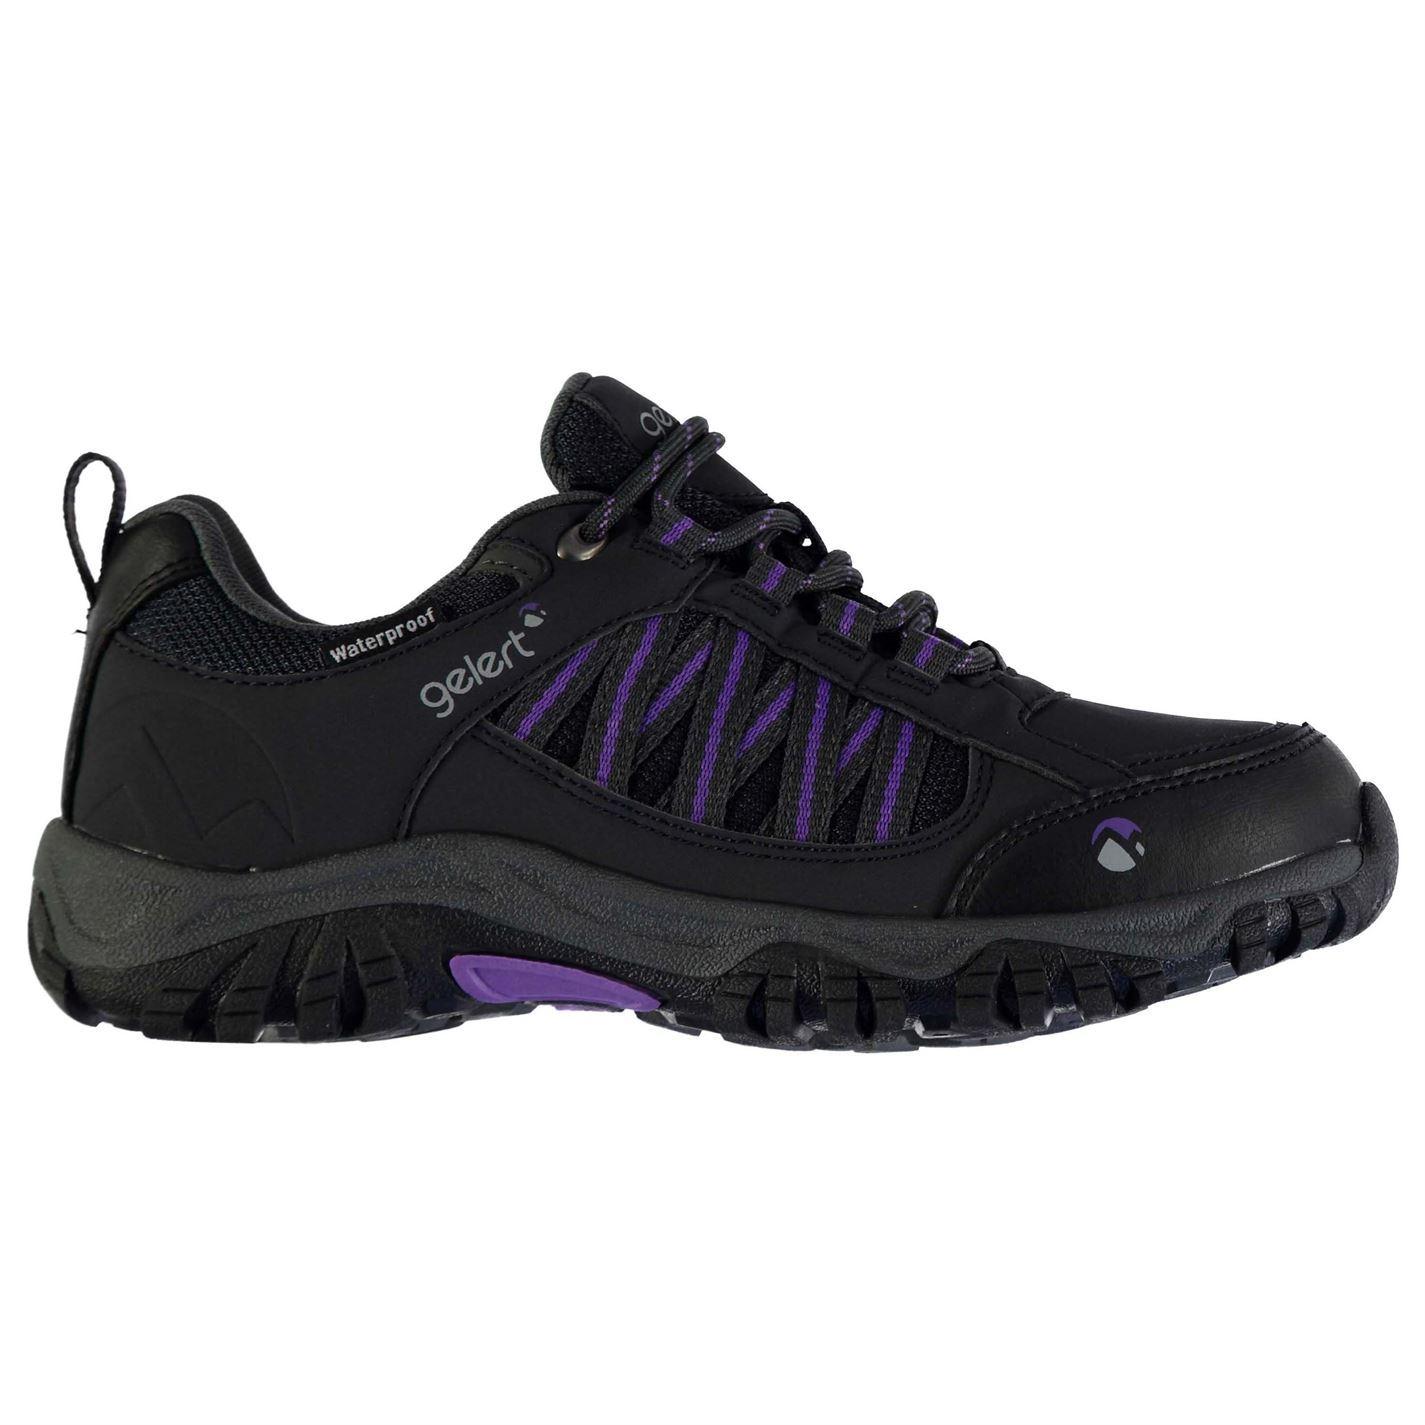 Sports Direct Womens Trekking Shoes